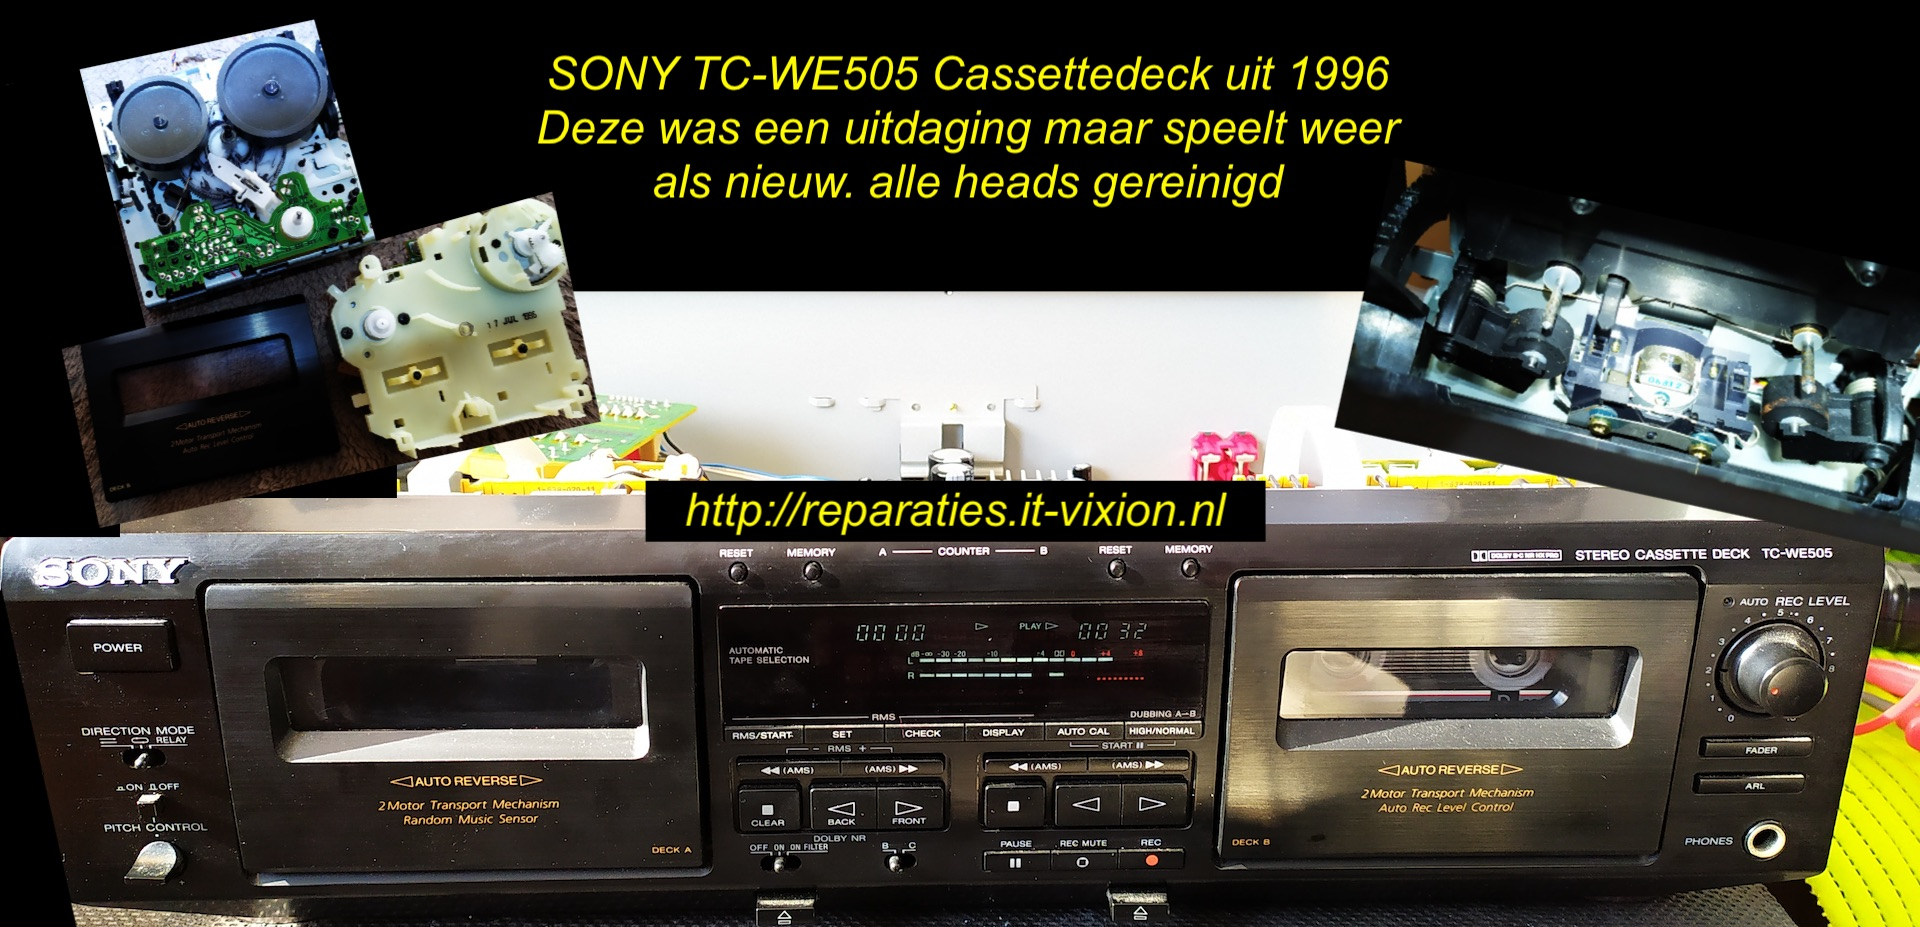 Sony TC-WE505 Cassette deck